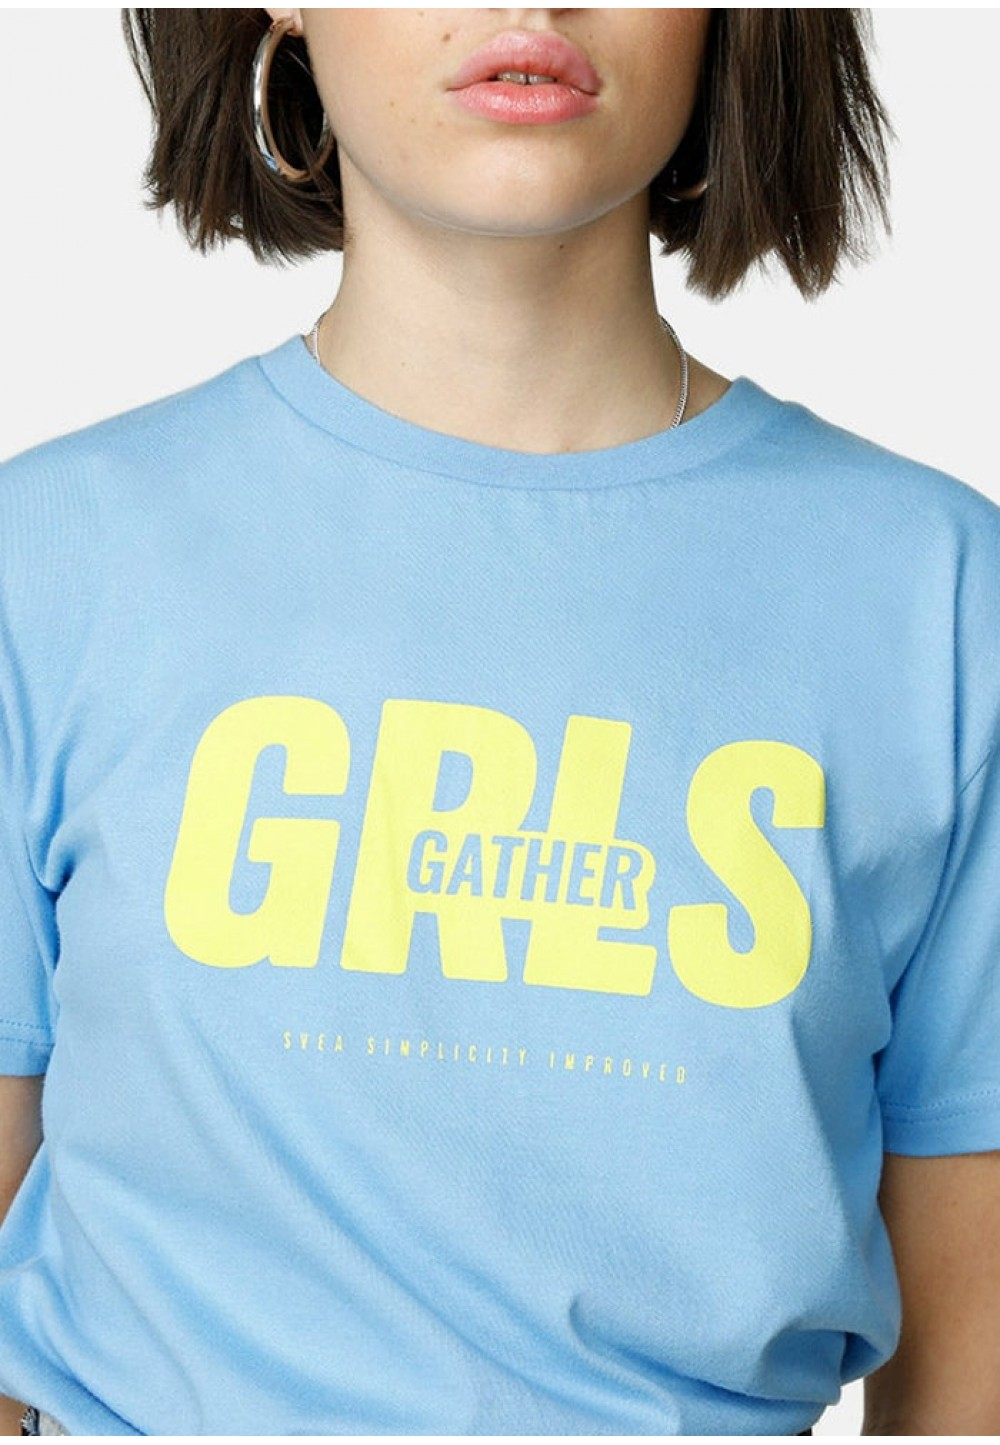 Футболка GRLS GATHER голубая